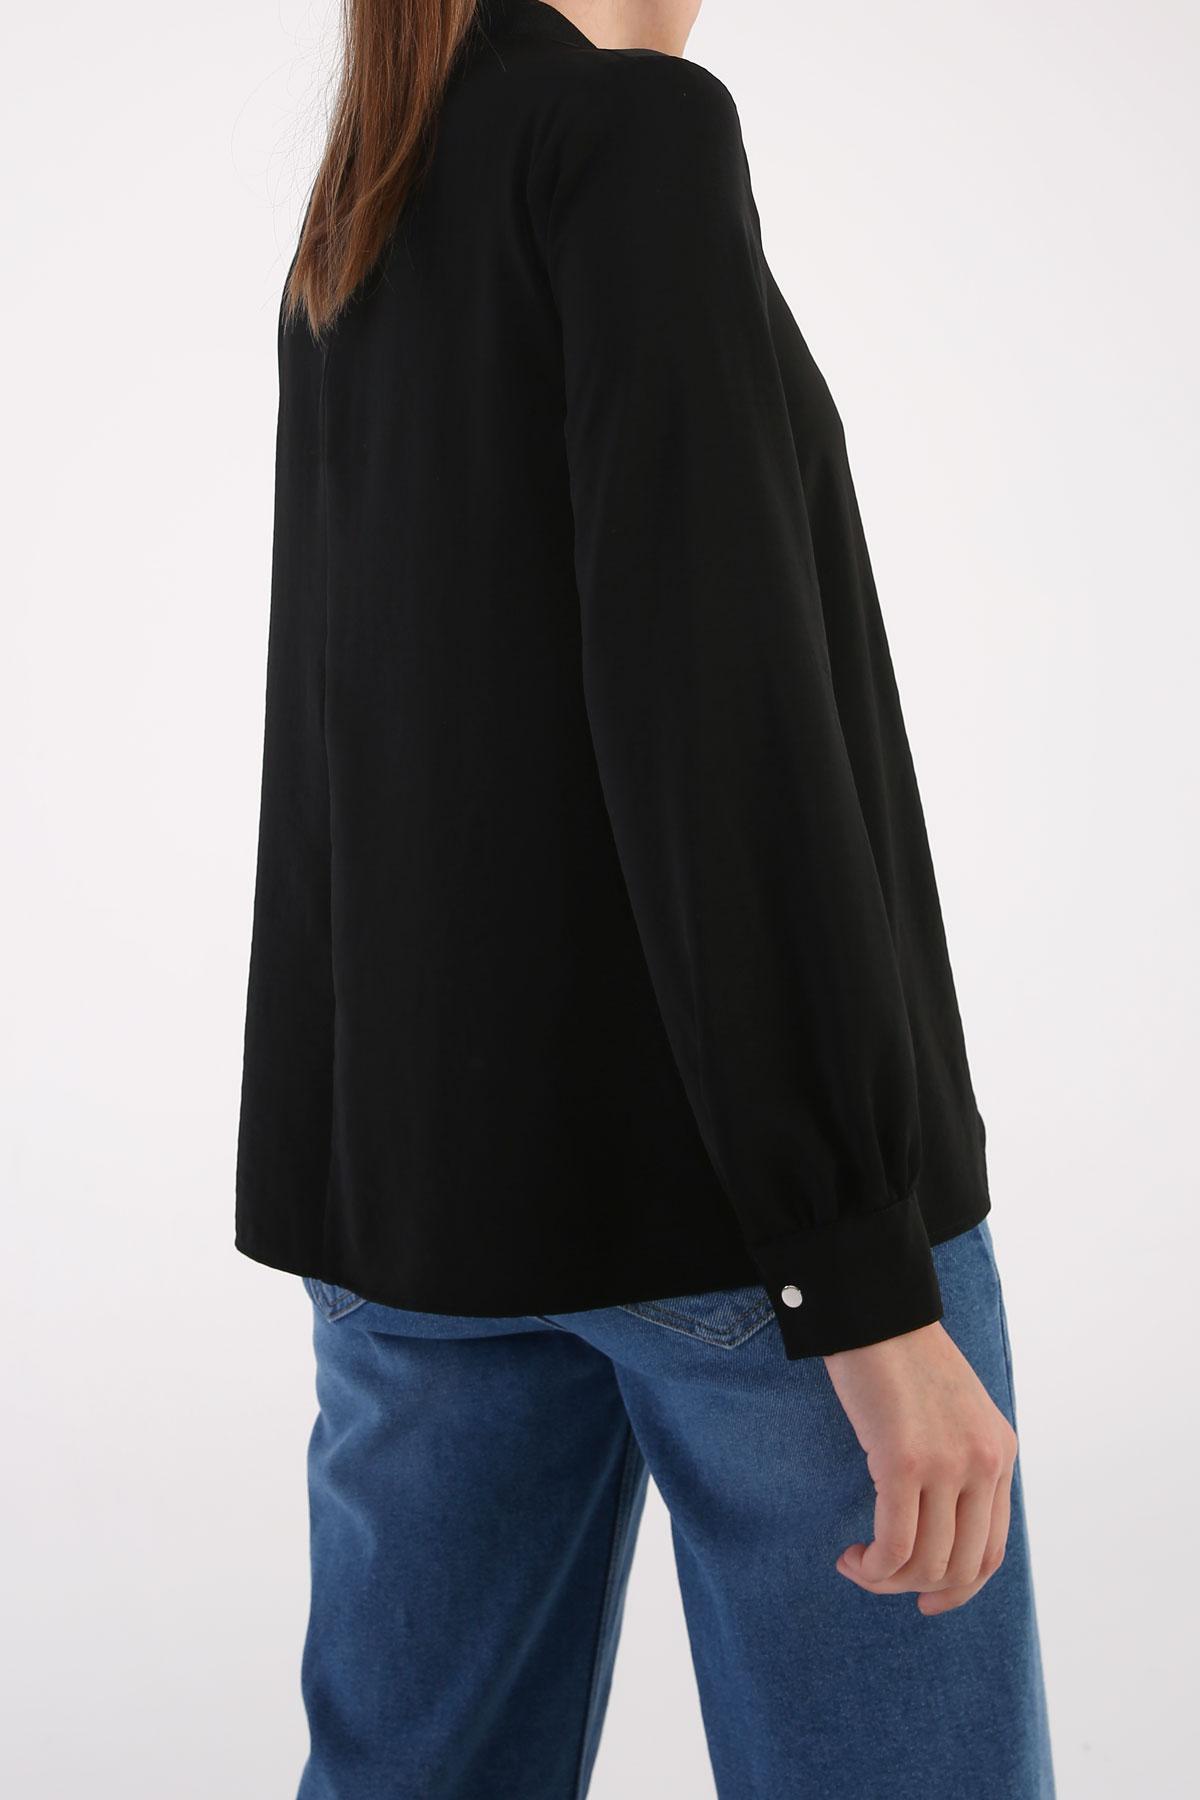 High Neck Cuff Detailed Zippered Blouse